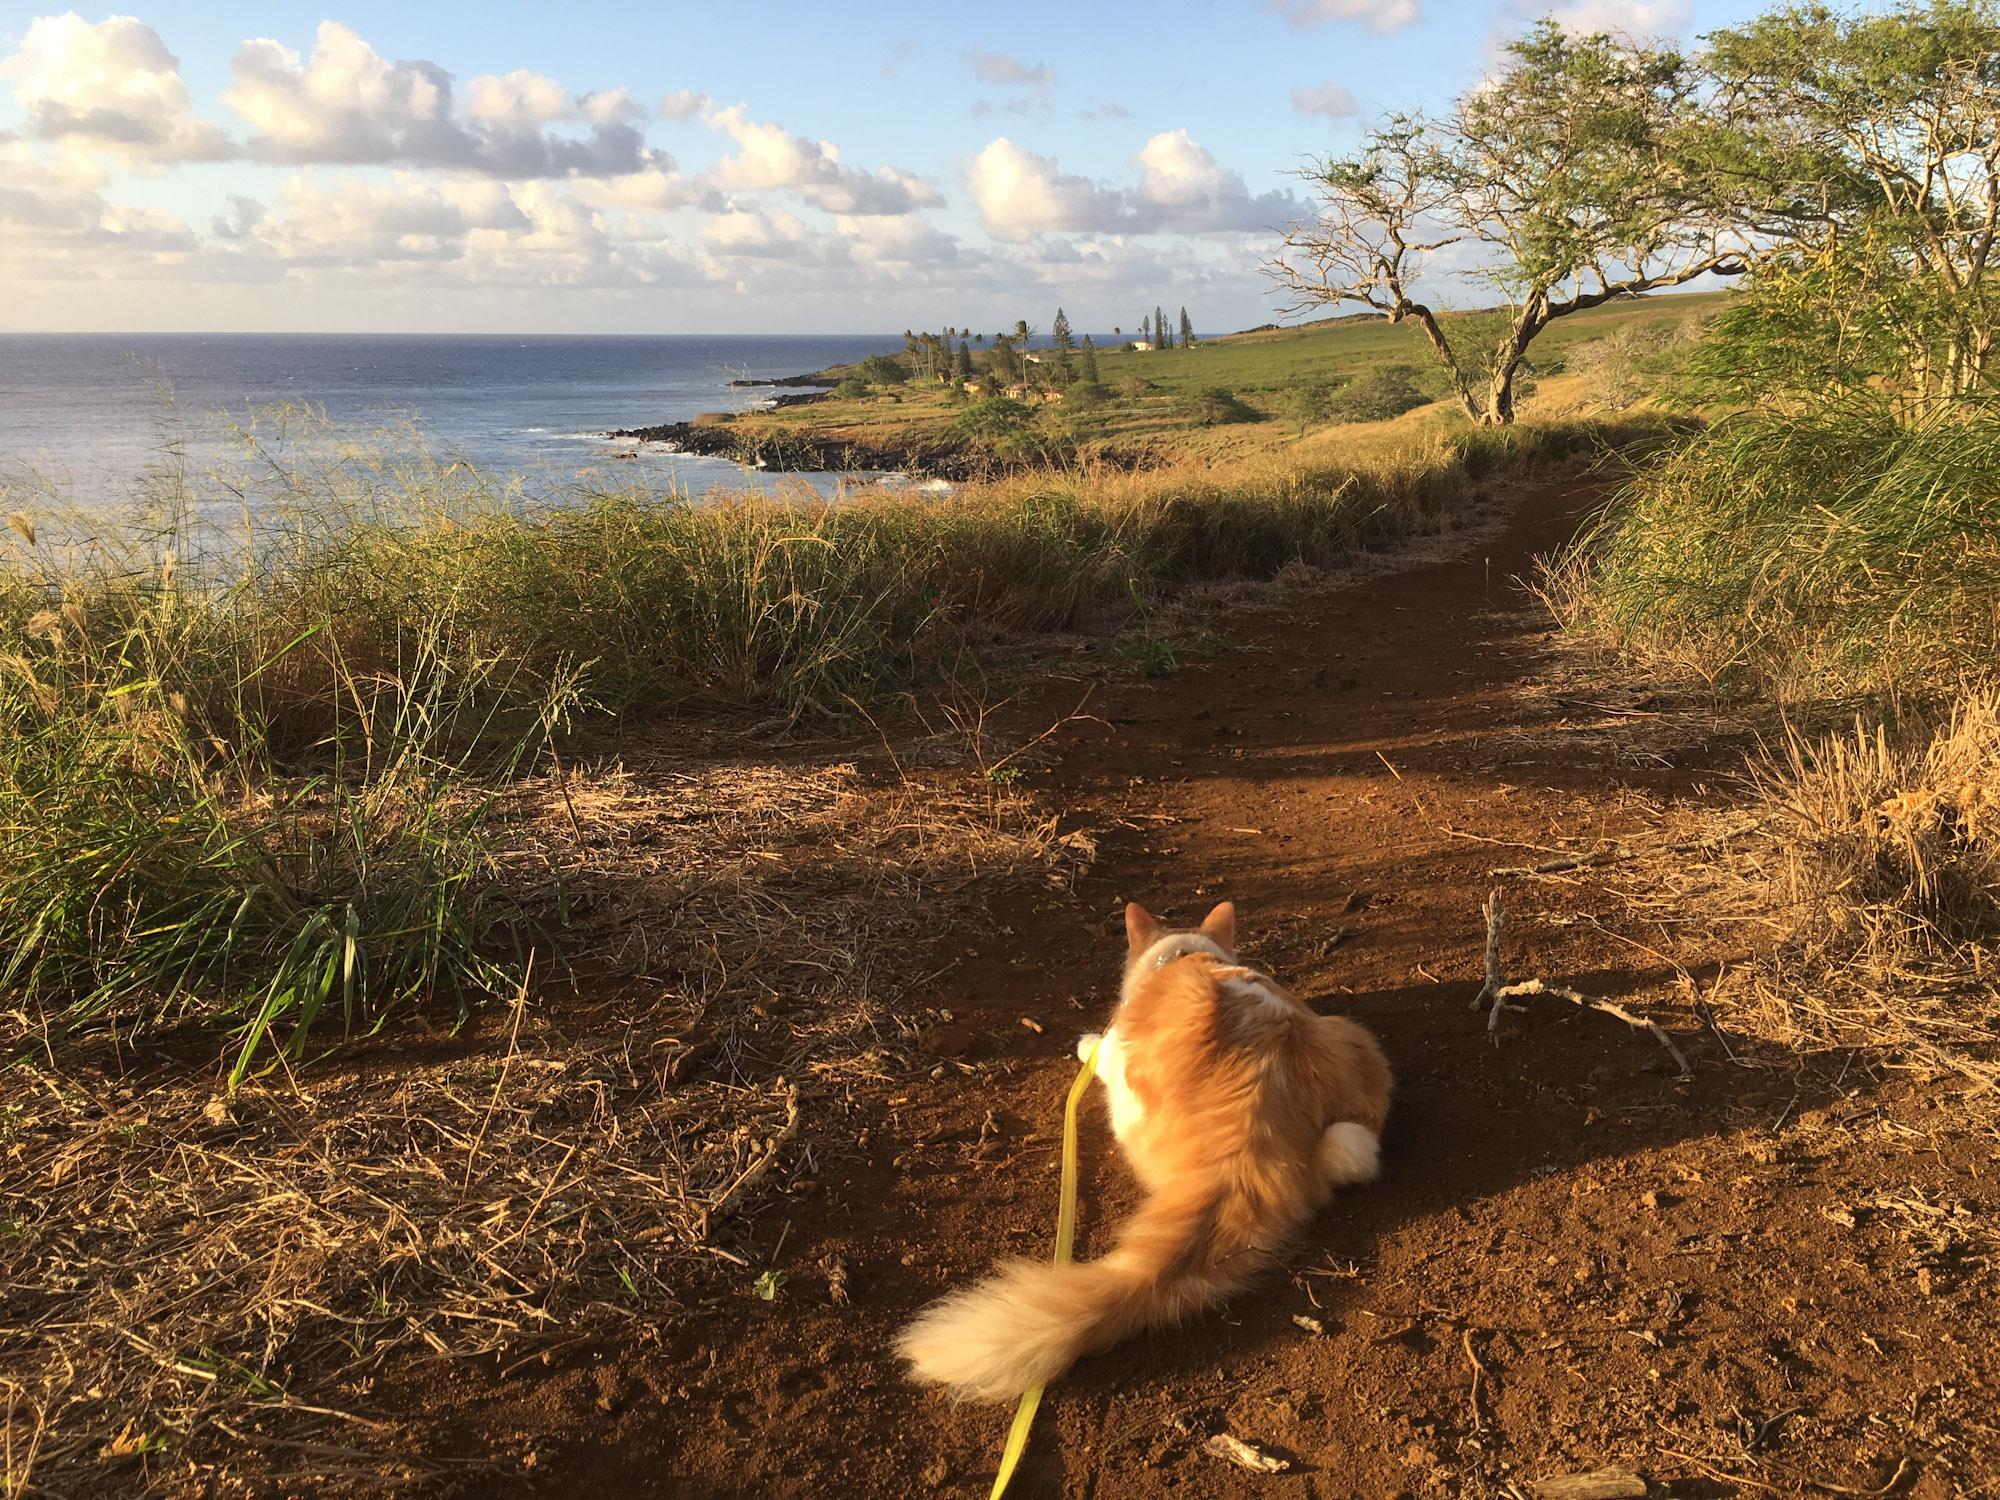 Atlas the cat in Hawaii